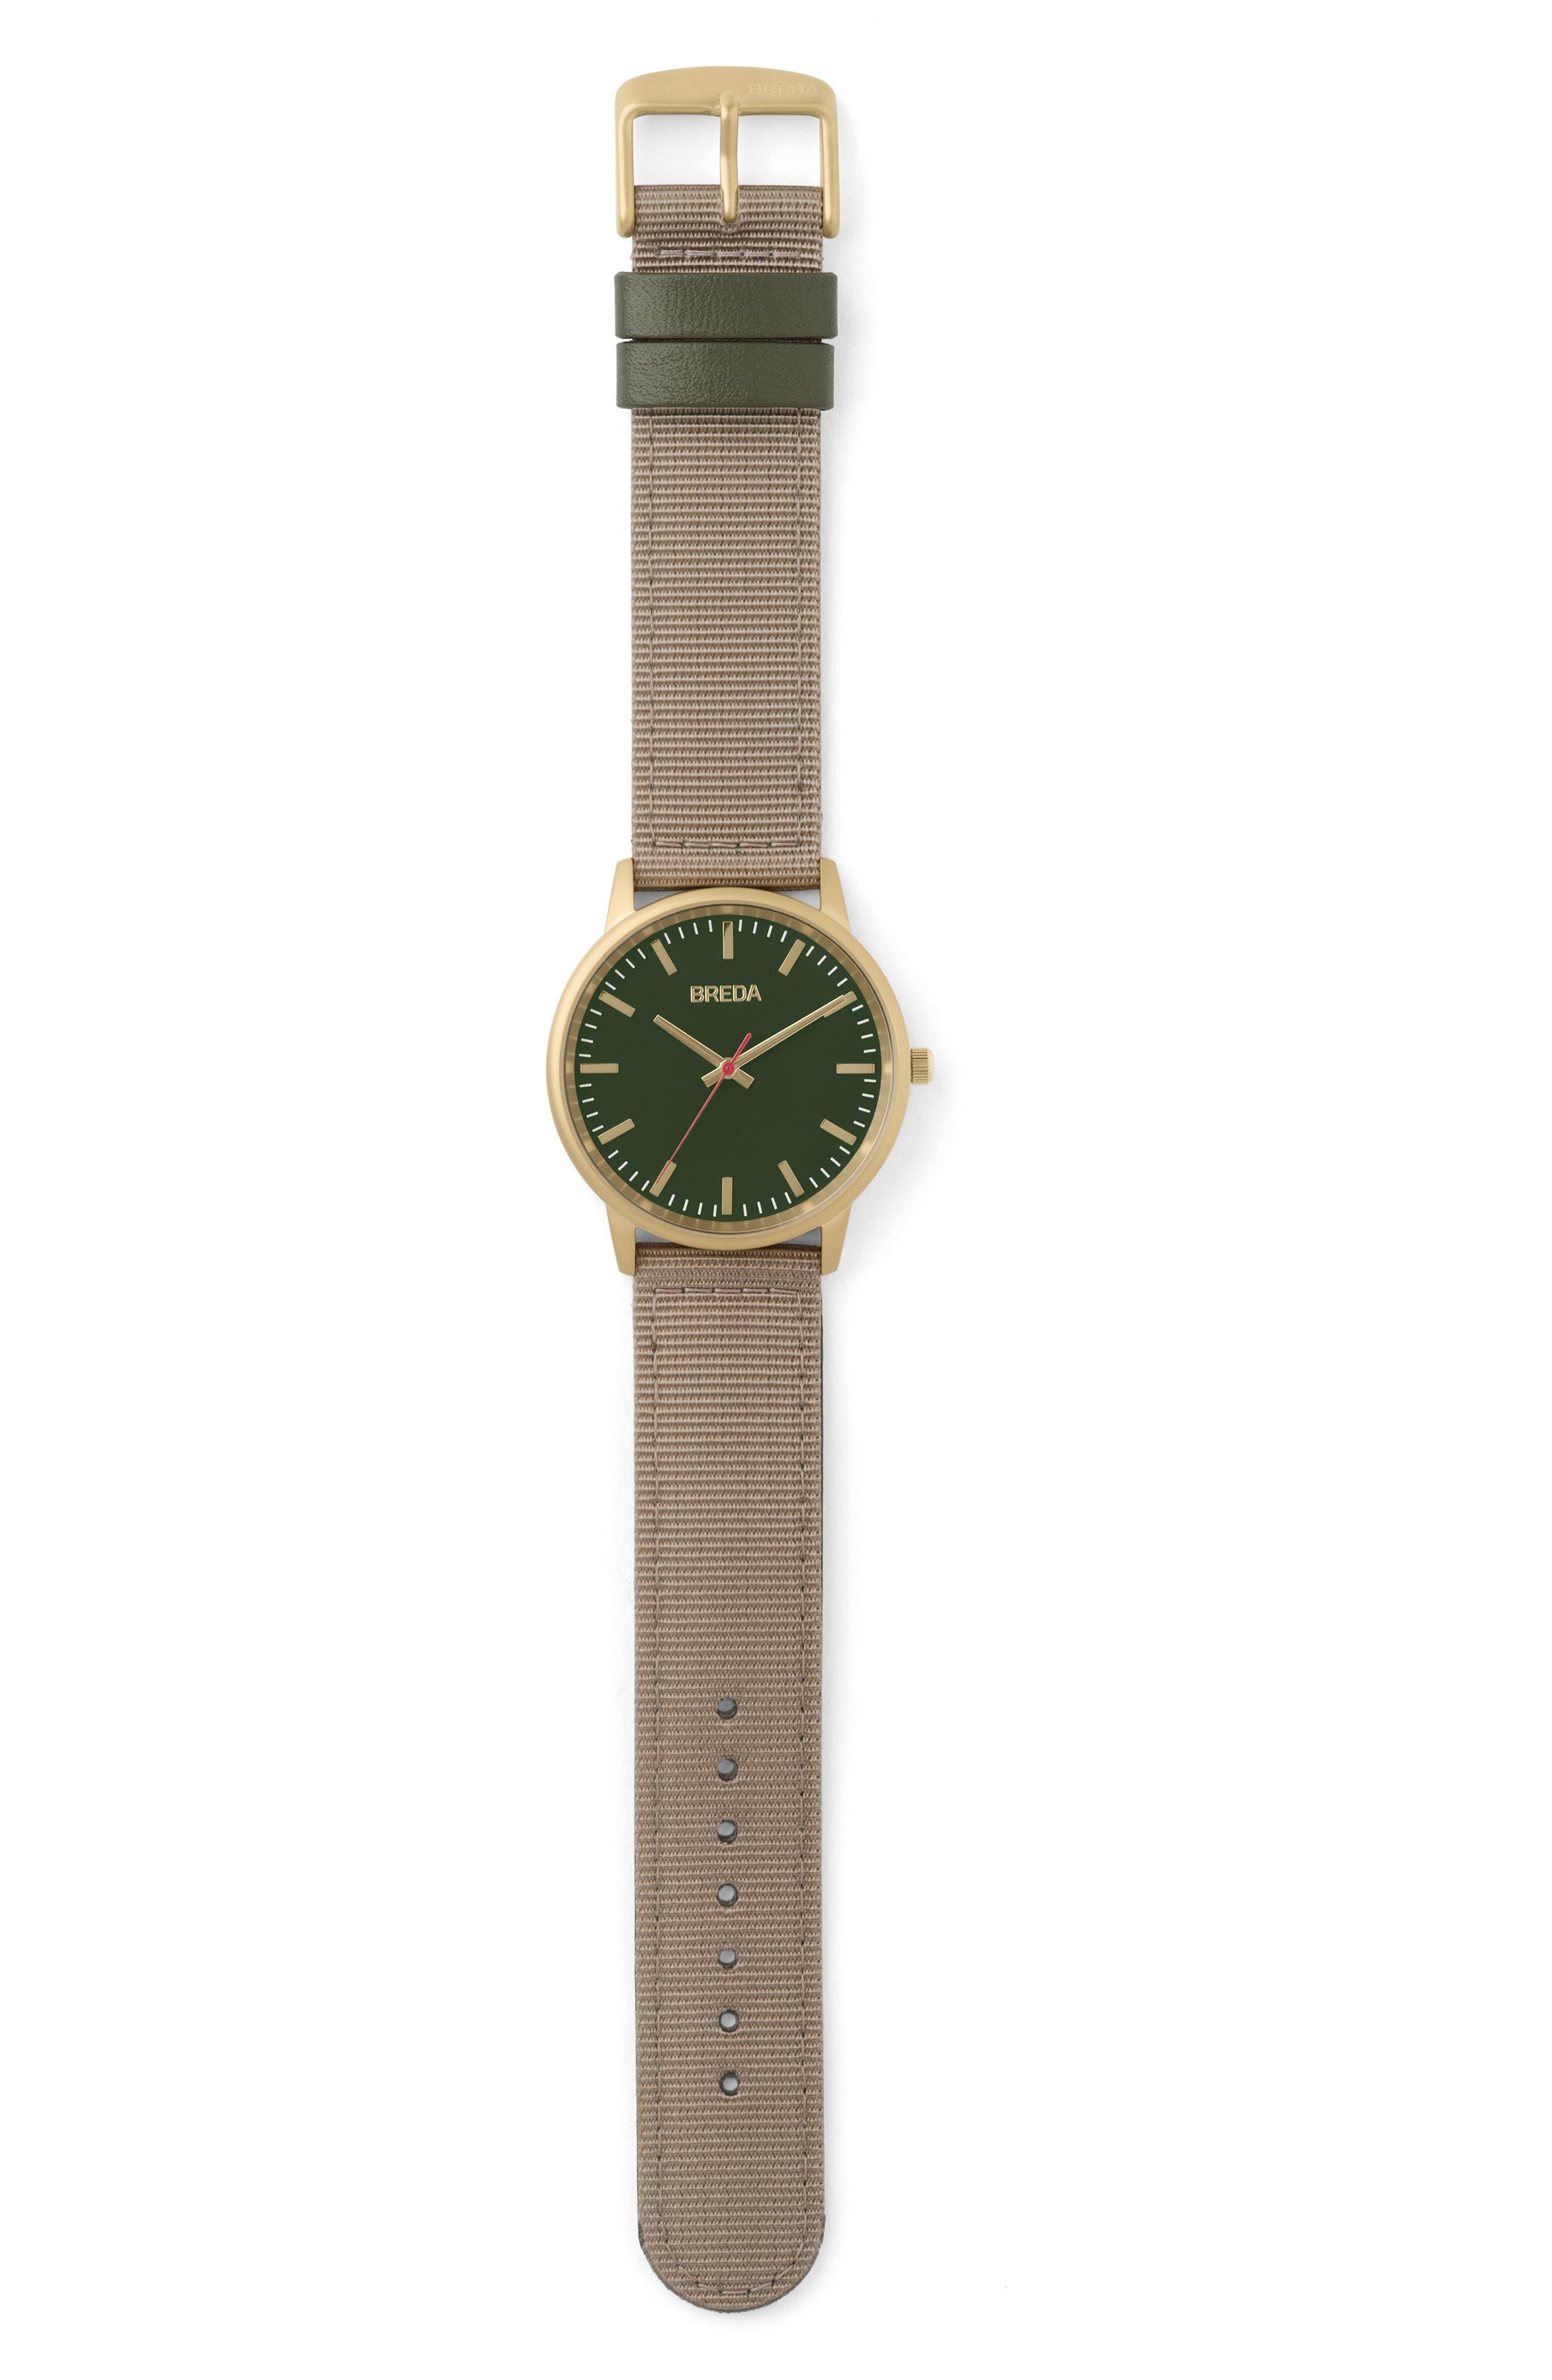 BREDA, Valor Nylon Strap Watch, 39mm, Alternate thumbnail 2, color, 250